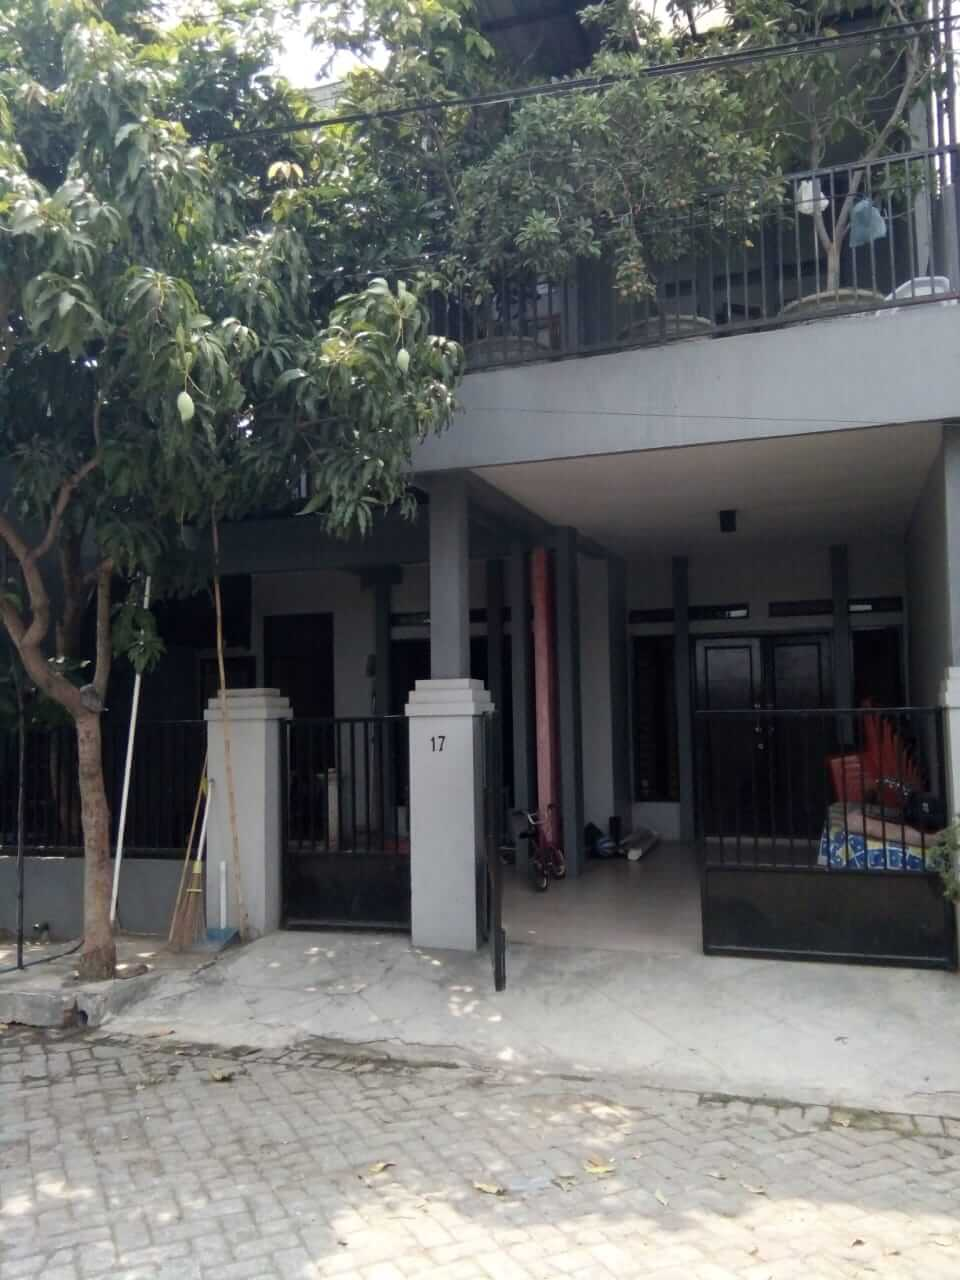 Jual Rumah Minimalis Griya Candramas Sedati Sidoarjo - BeliSewaRumah - Tampak Depan